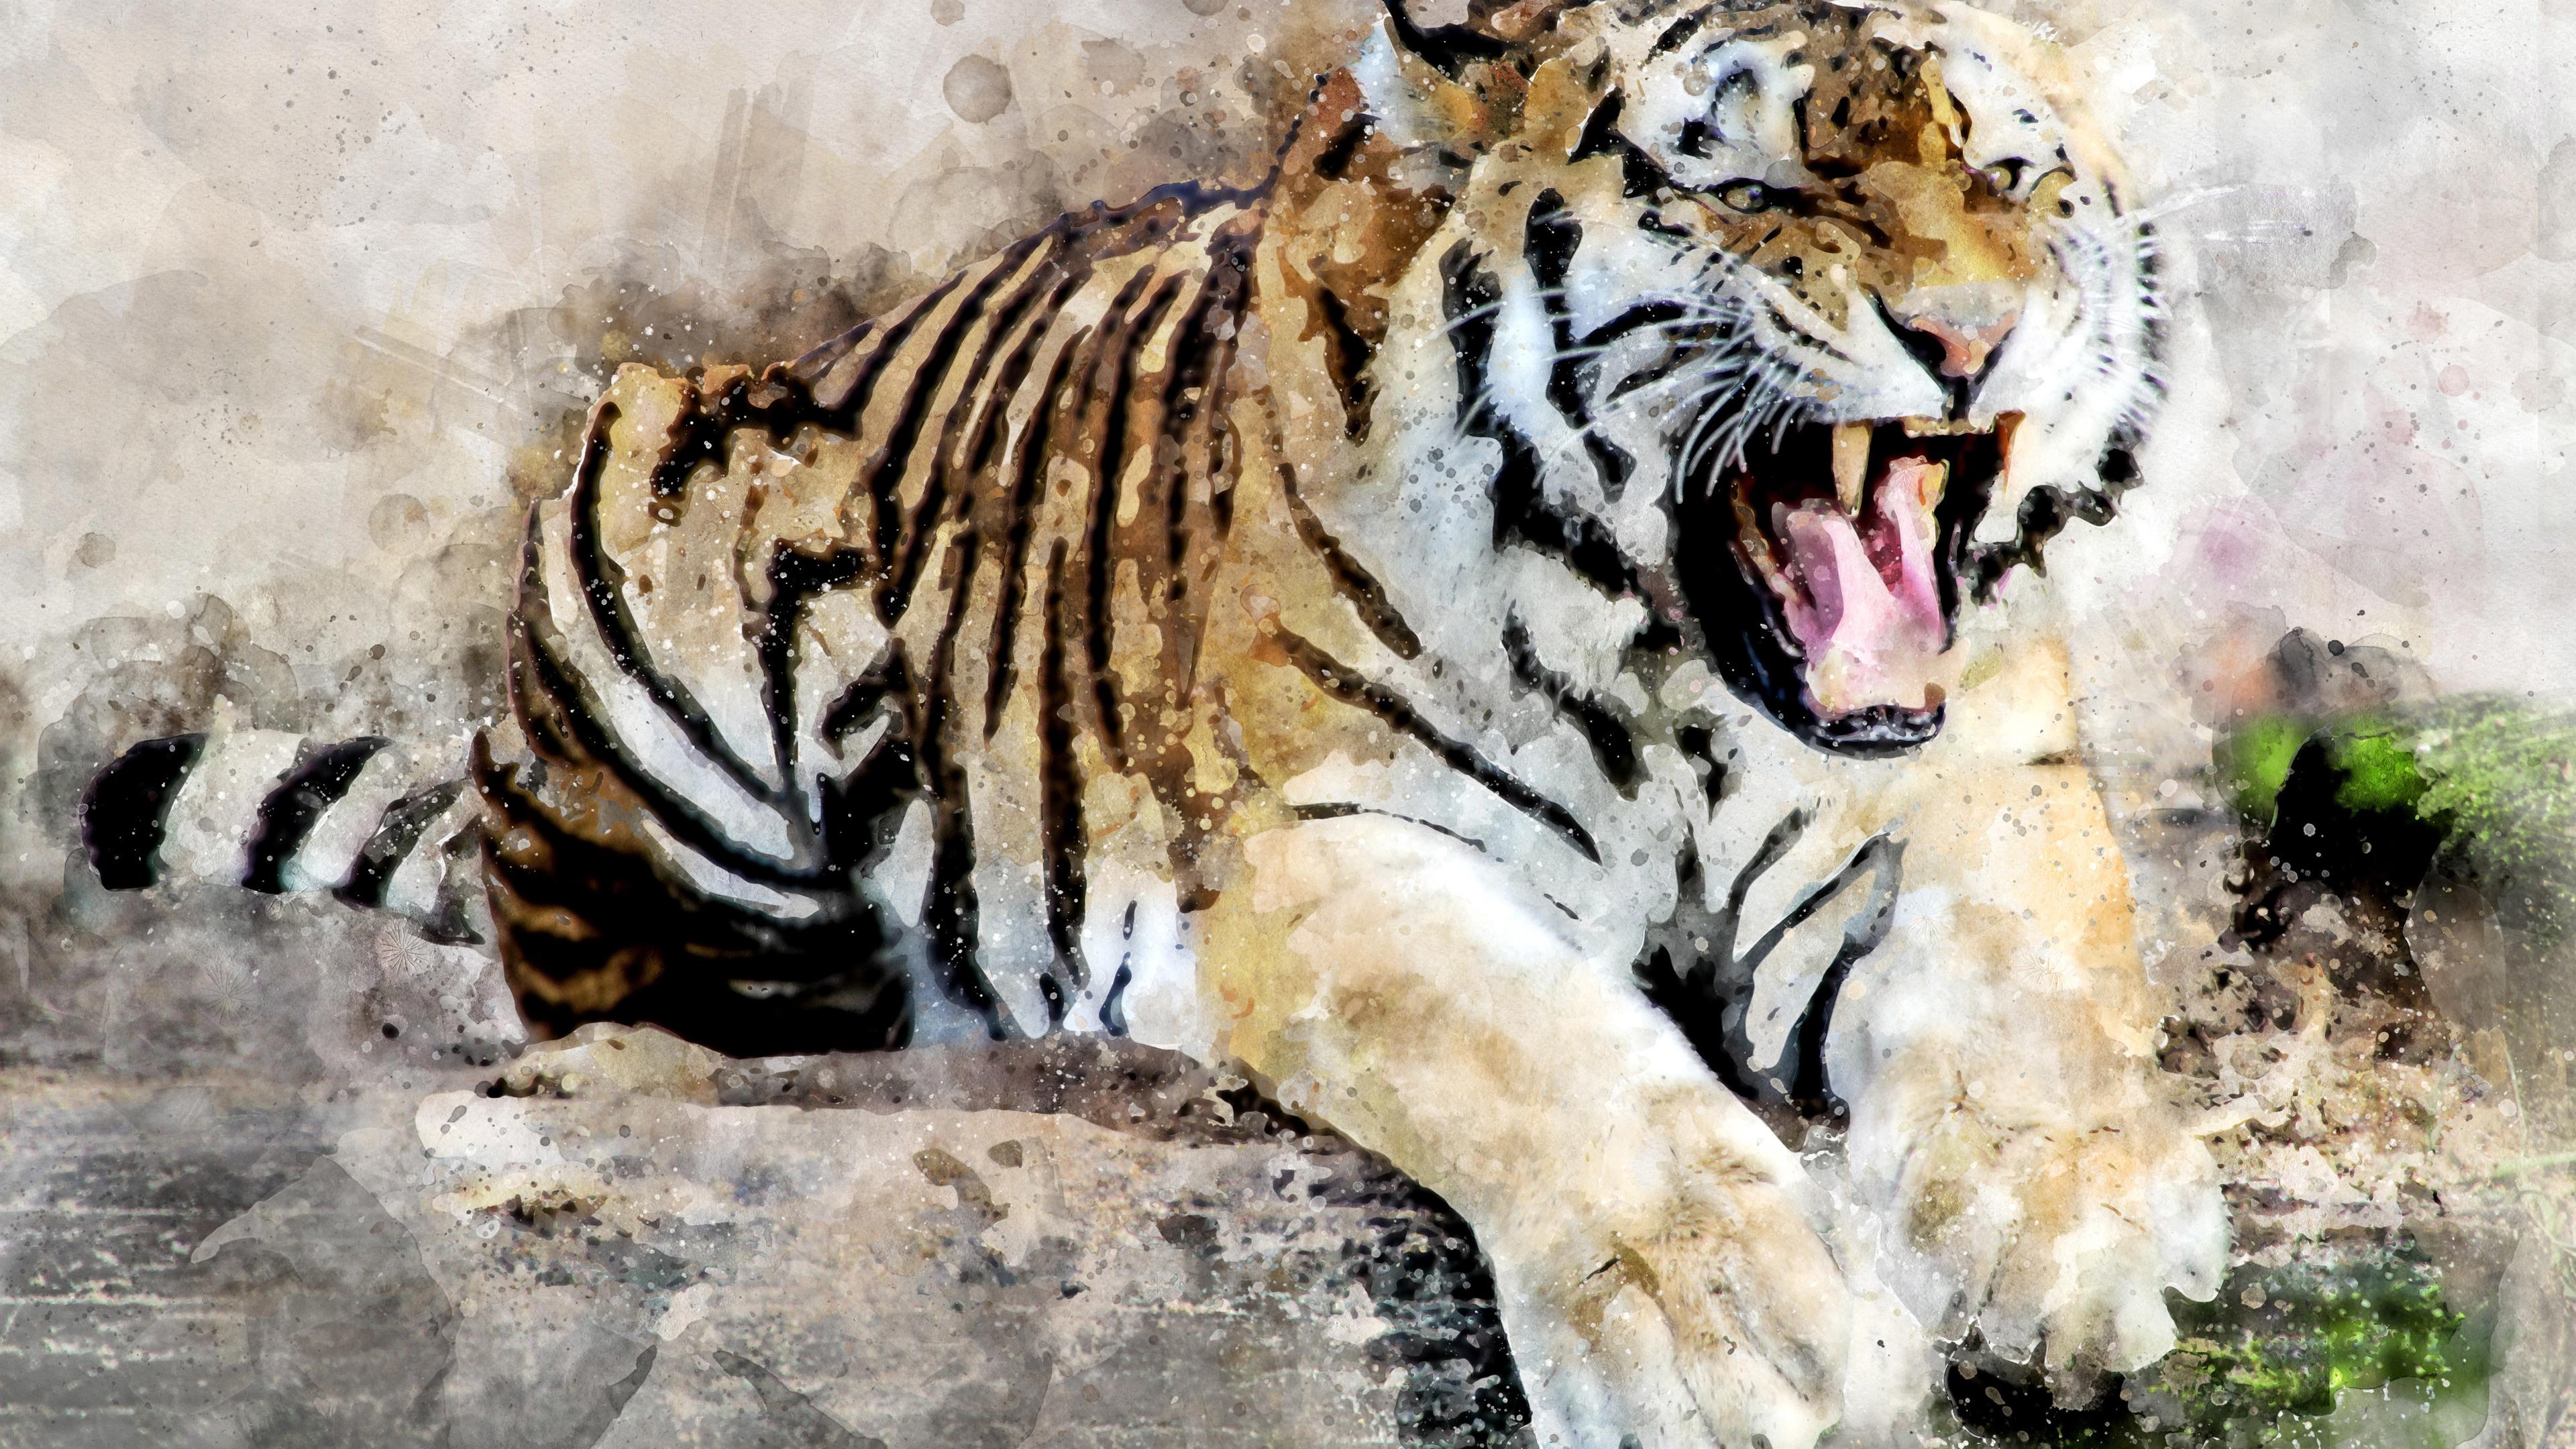 tiger abstract art 4k 1540749989 - Tiger Abstract Art 4k - tiger wallpapers, roar wallpapers, hd-wallpapers, digital art wallpapers, artwork wallpapers, artist wallpapers, animals wallpapers, abstract wallpapers, 4k-wallpapers